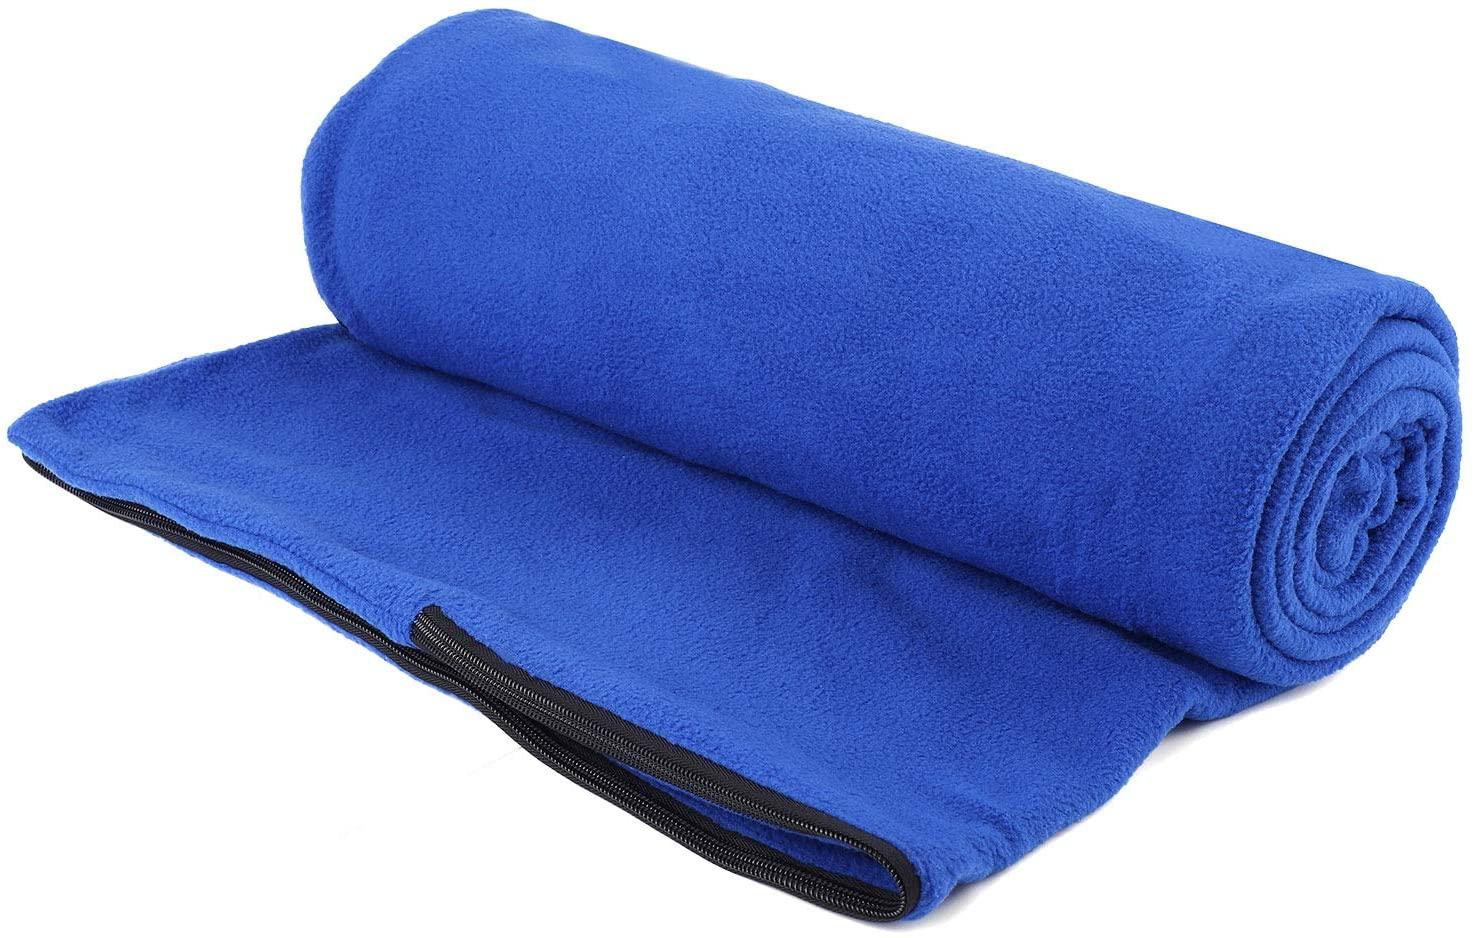 Fleece Sleeping Bag Liner Travel Sheet Camping Sleep Sack Ultralight Zippered Storage Bag Full Sized Zipper Backpacking Blanket for Traveling, Camping, Hiking, Outdoor Activities